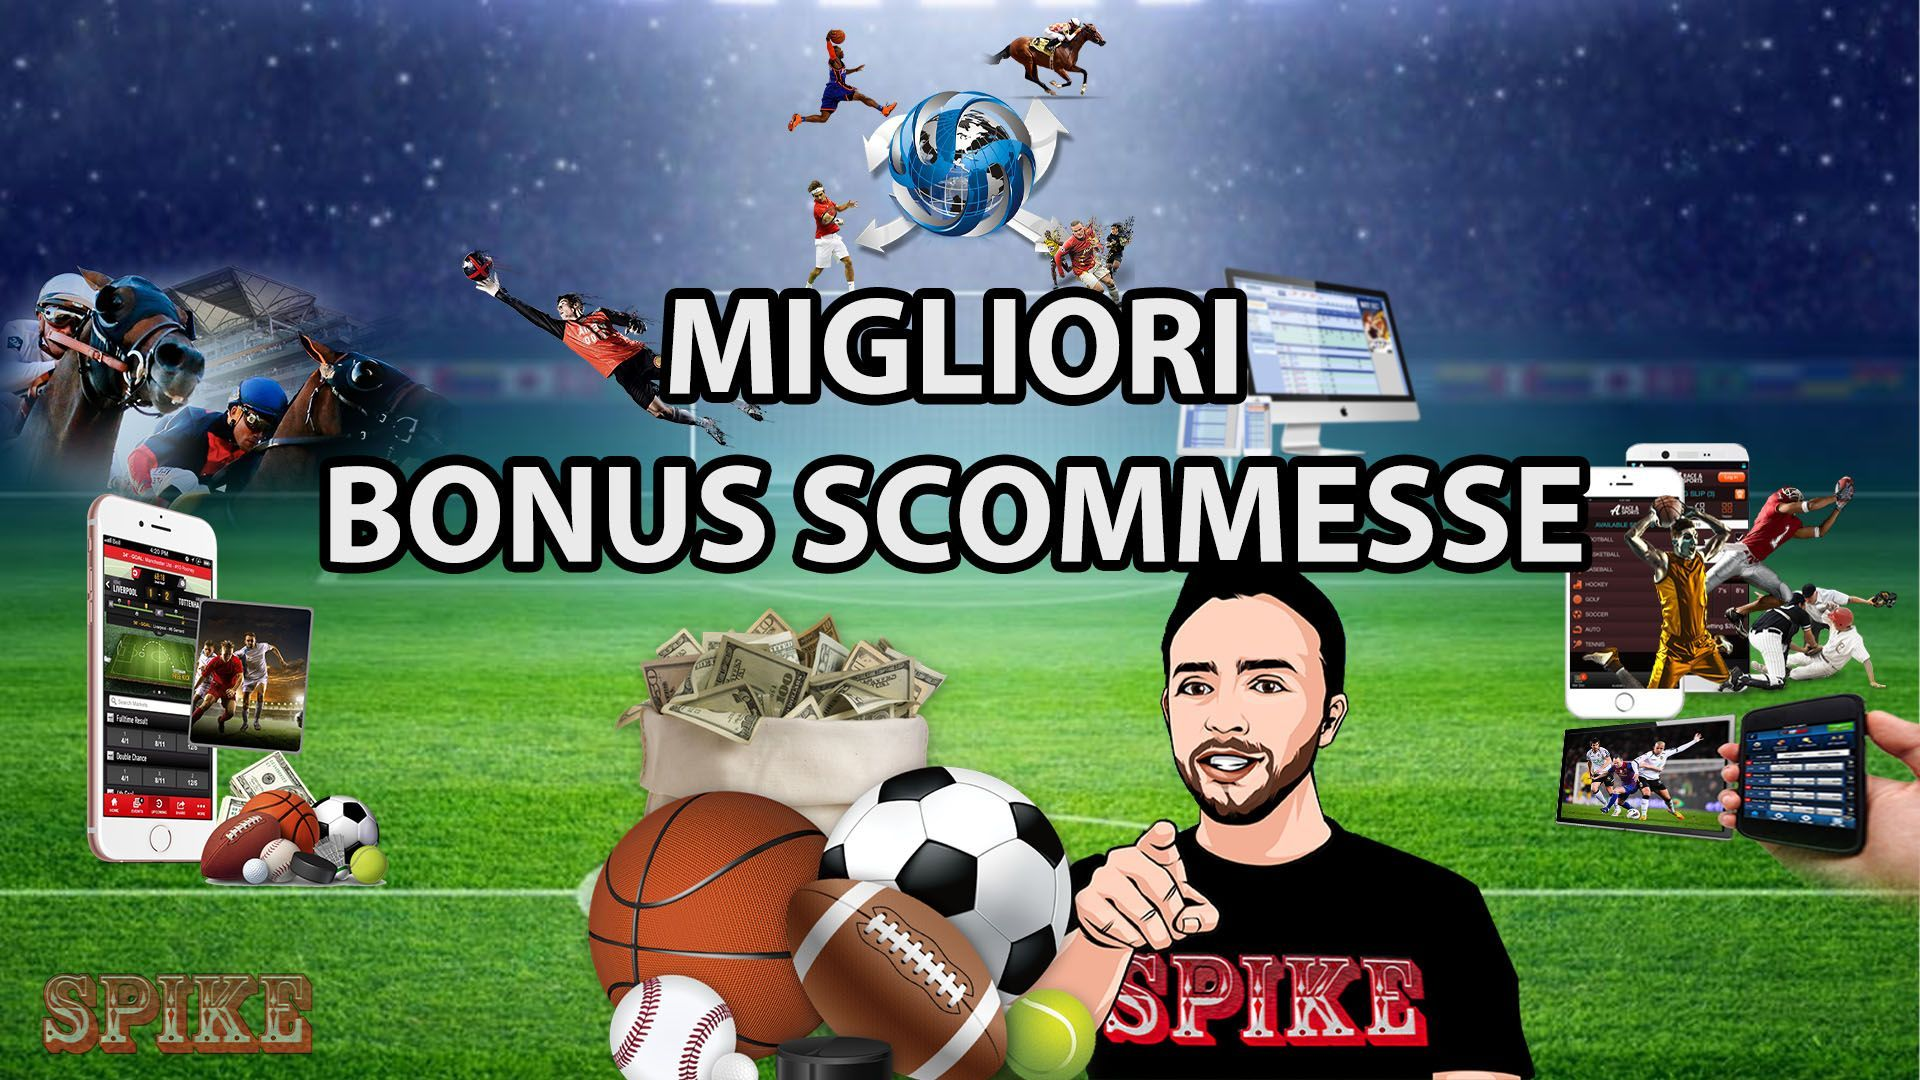 Guida ai Migliori Bonus per Scommesse Sportive Online